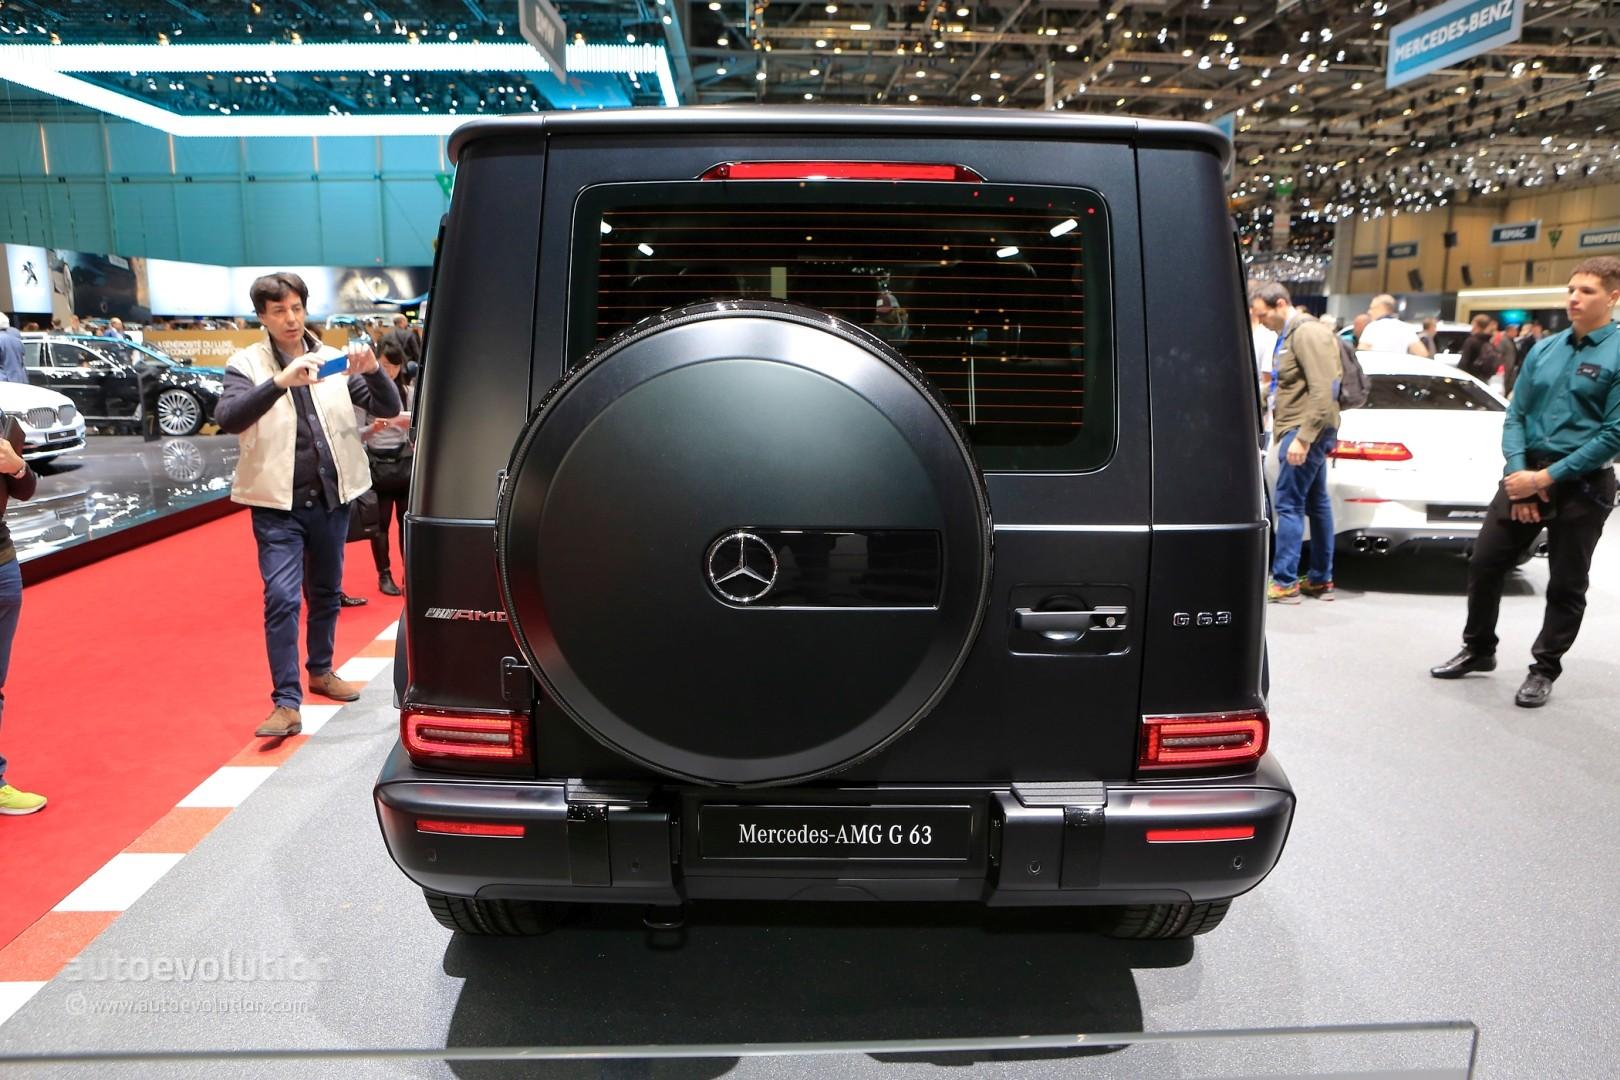 Mercedes G63 2018 >> 2019 Mercedes-AMG G63 Edition 1 Shows Darth Vader Spec in Geneva - autoevolution